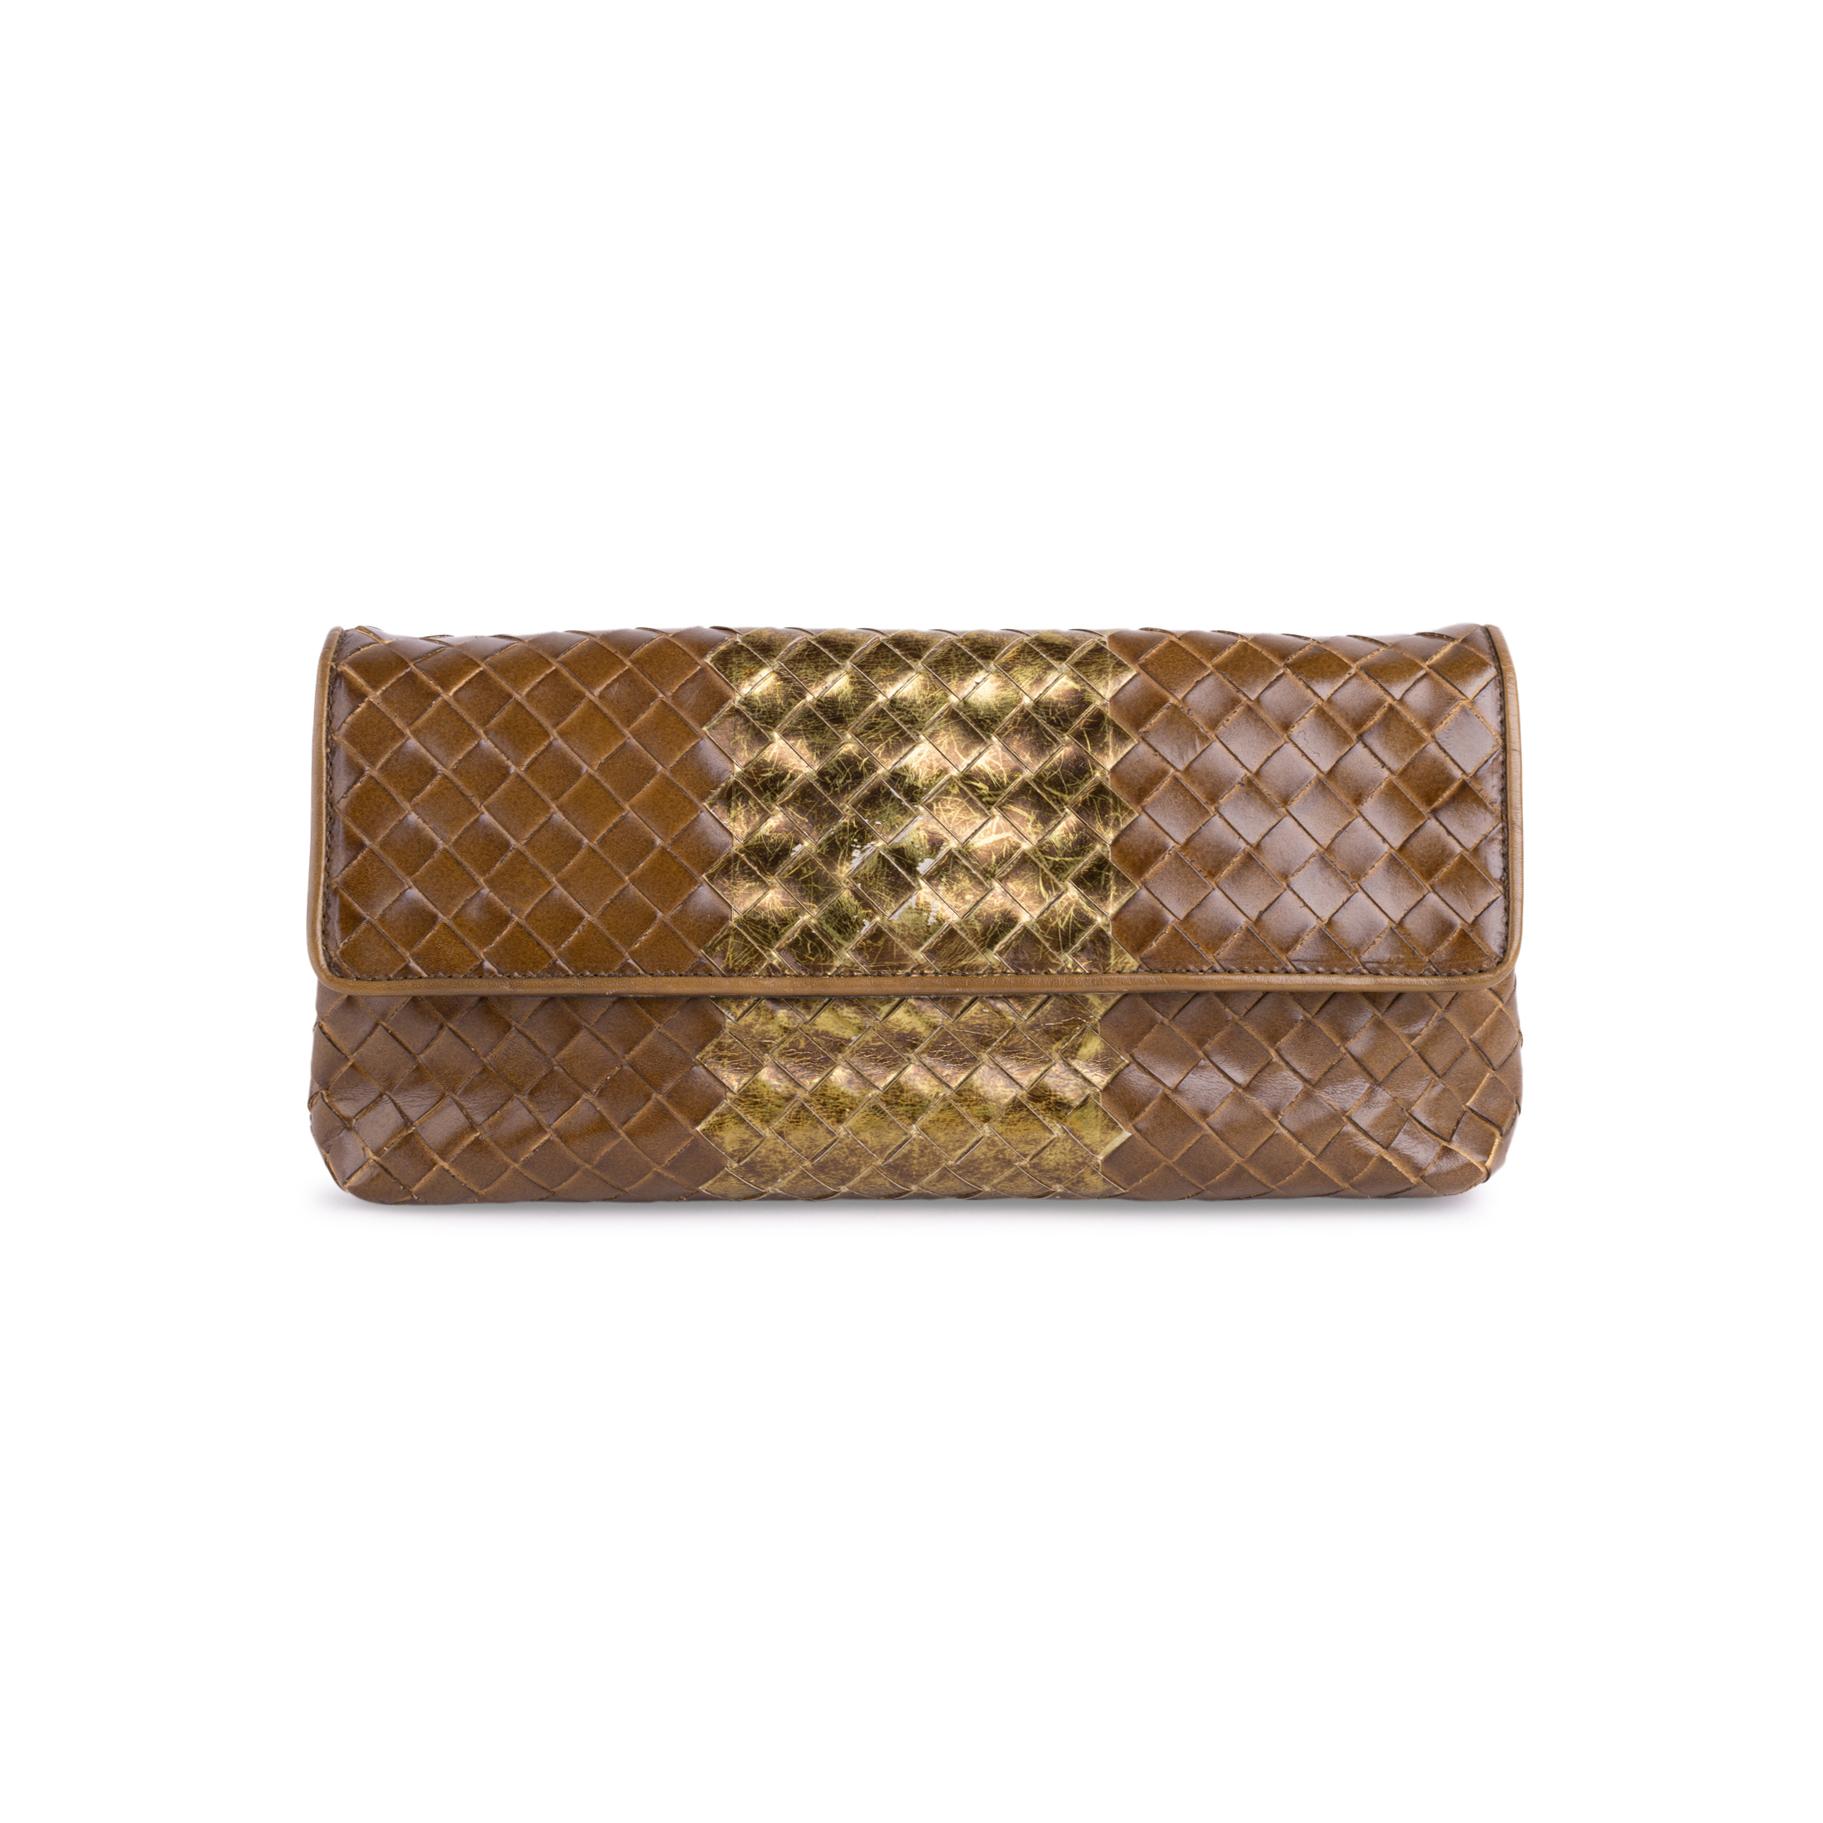 Authentic Second Hand Bottega Veneta Borsa Intrecciato Liquid Strip Clutch  (PSS-515-00273)  c1e9084a2aa09